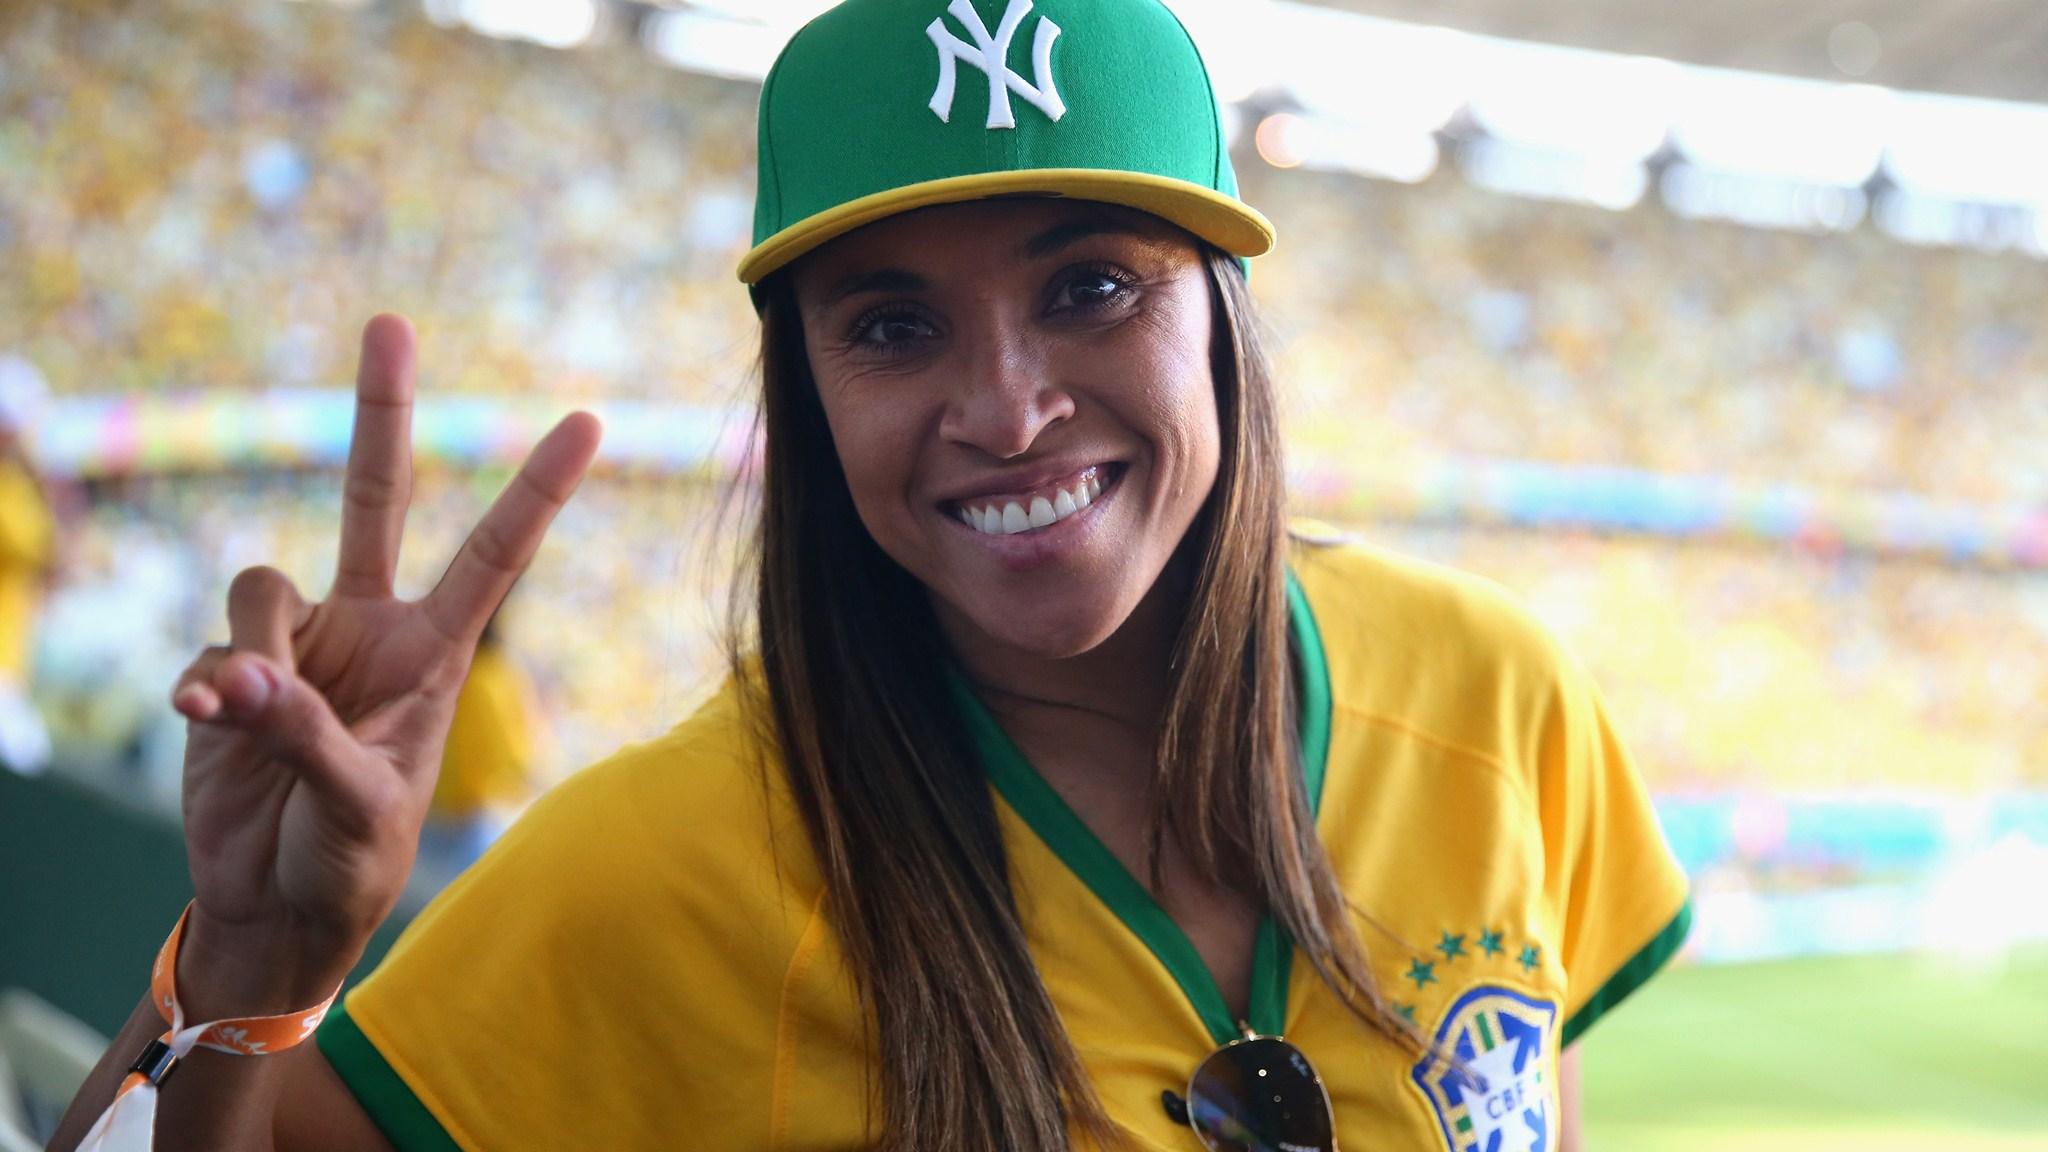 221 - Brazil-Colombia [2-1] -- 04 Jul 2014 - 17-00 - kuaza